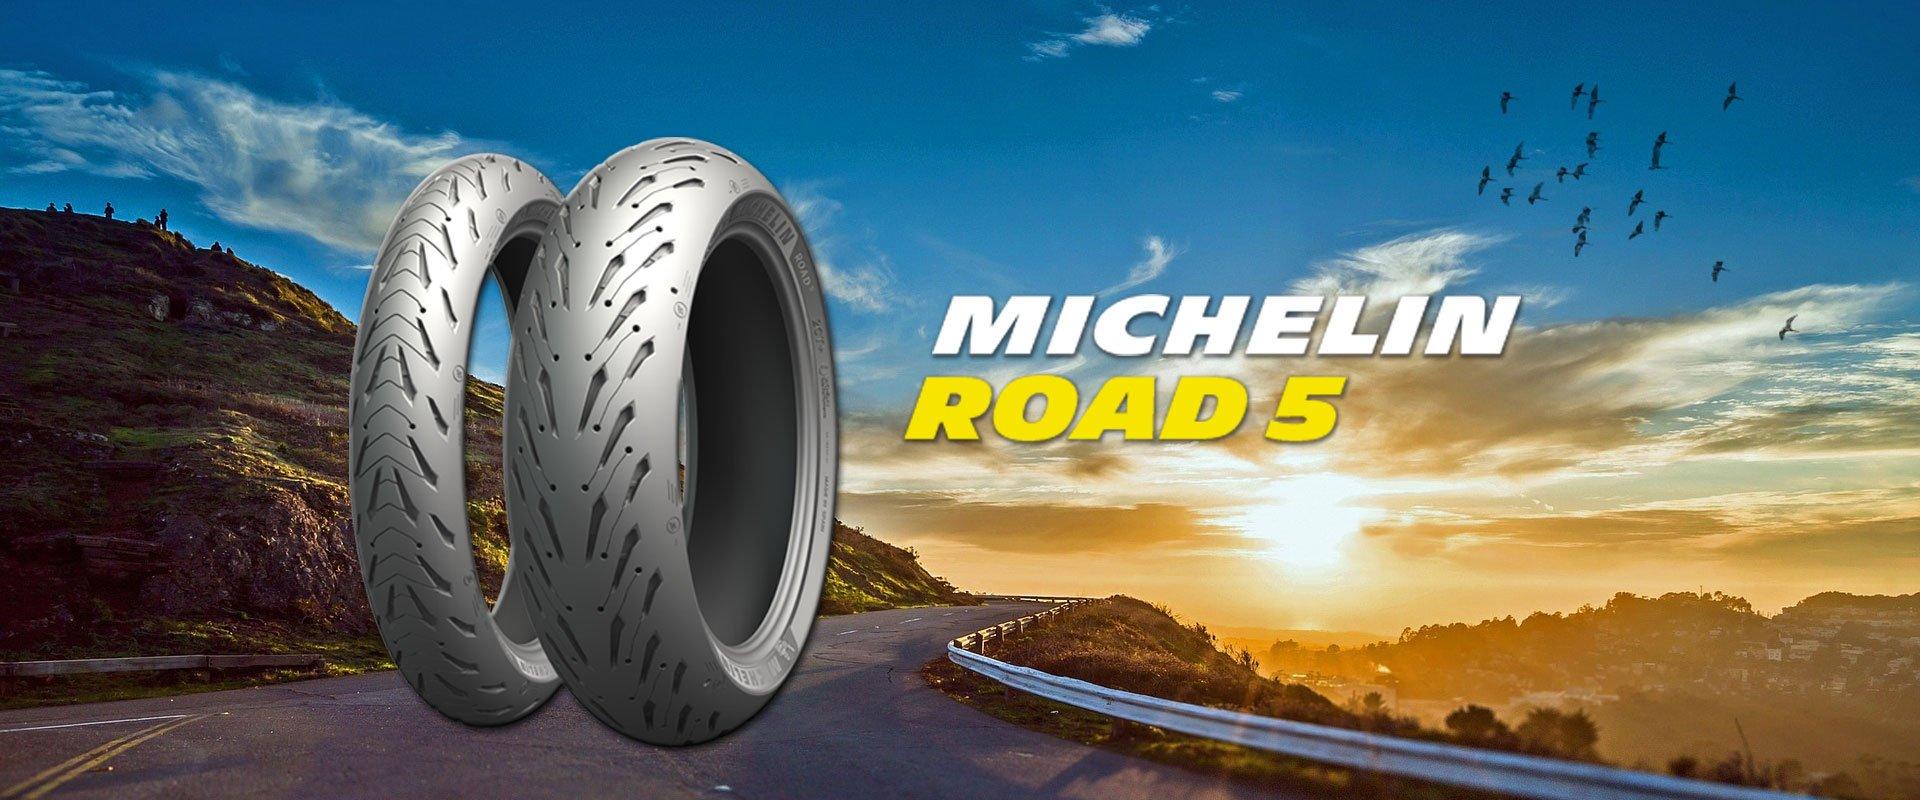 jeu concours michelin road 5